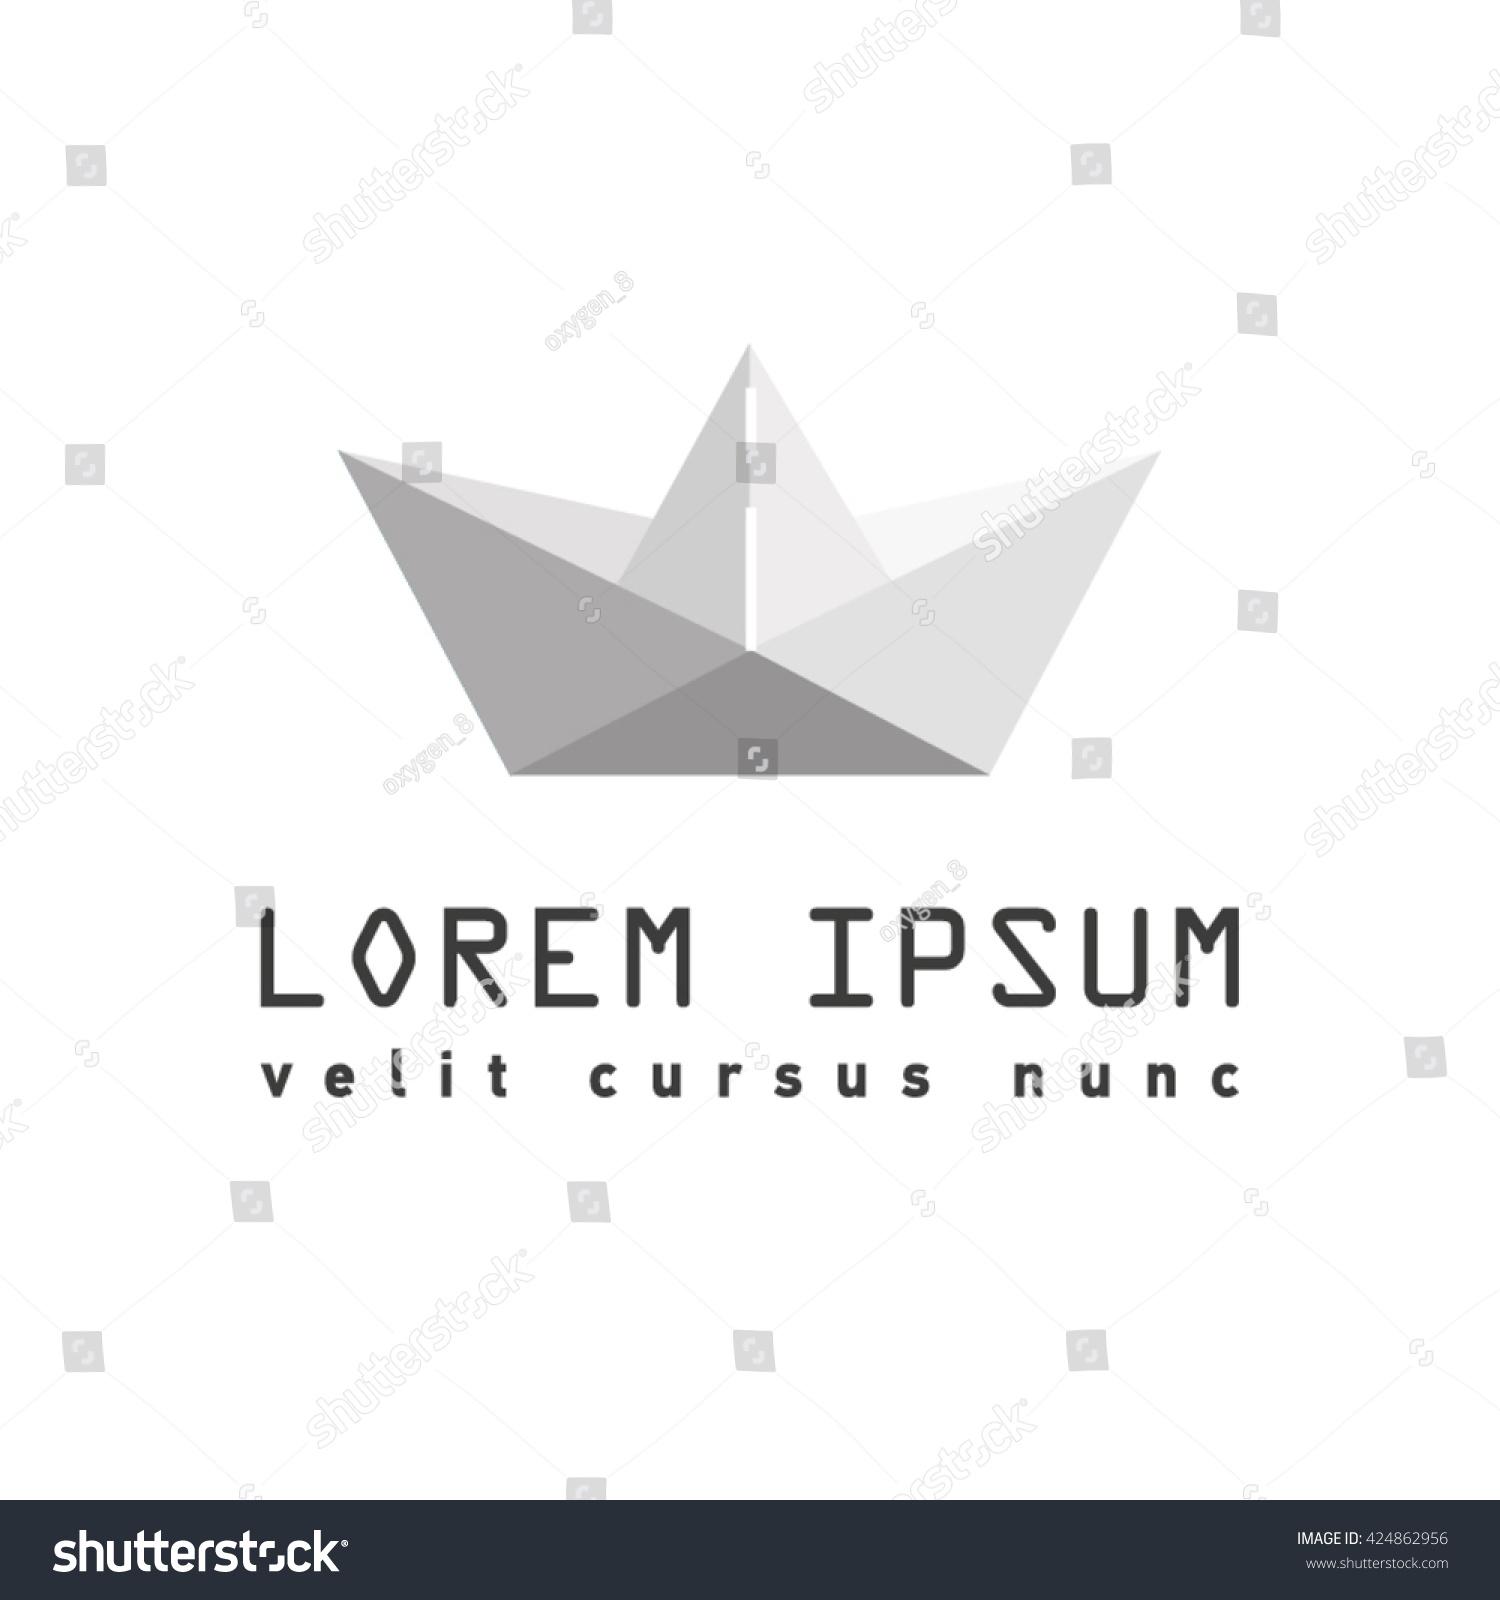 Origami paper ship origami symbol paper stock vector 424862956 origami paper ship origami symbol paper ship logo buycottarizona